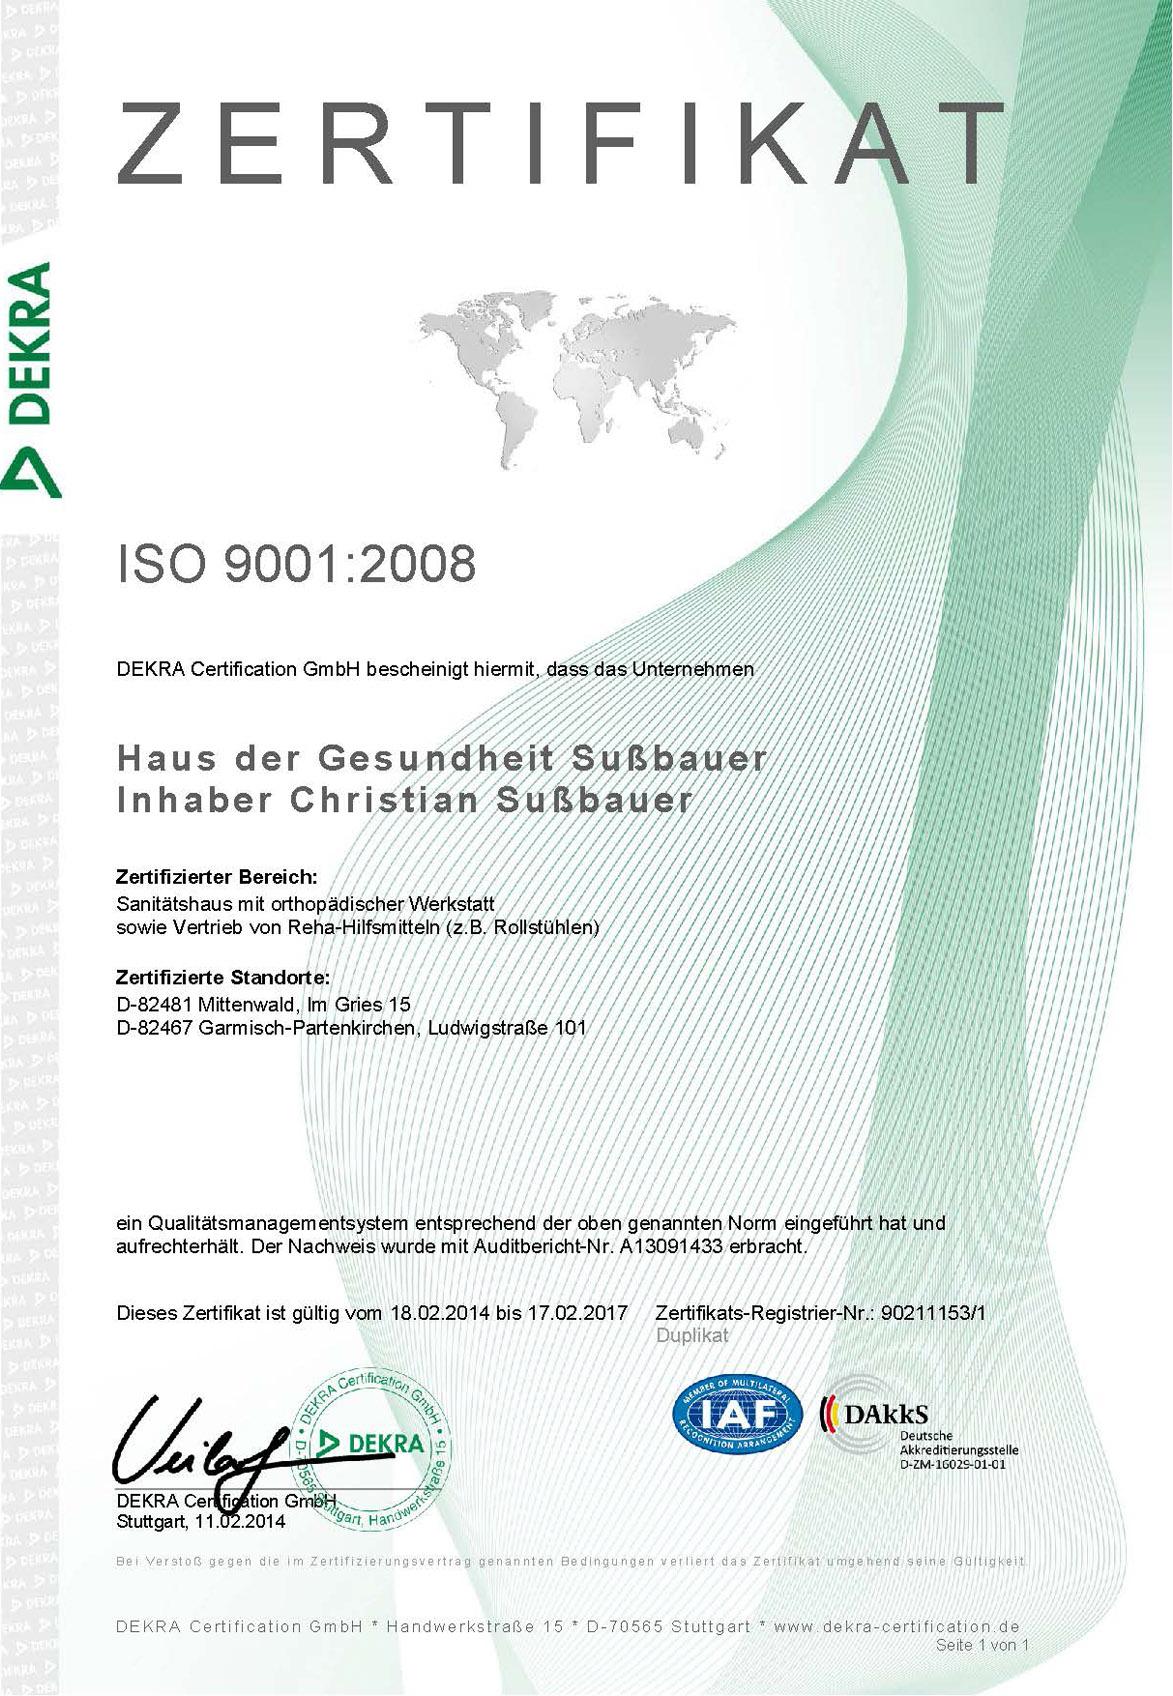 Zertifikat 90211153_1 ger